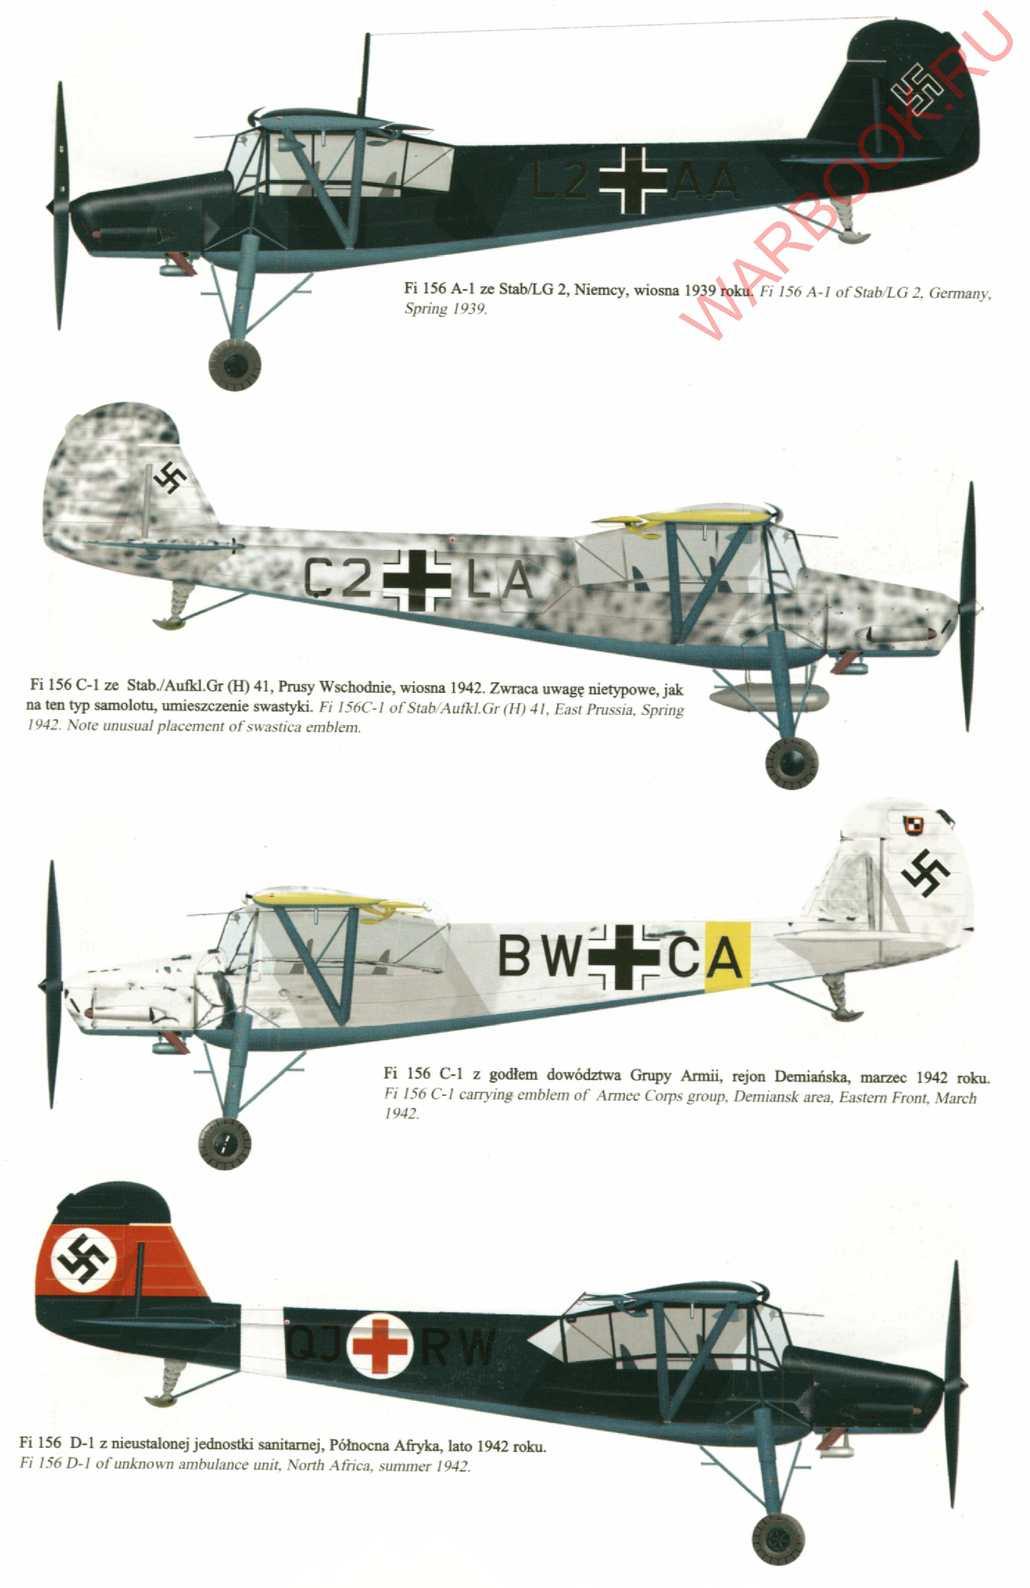 Fieseler Storch Fi 156 P73